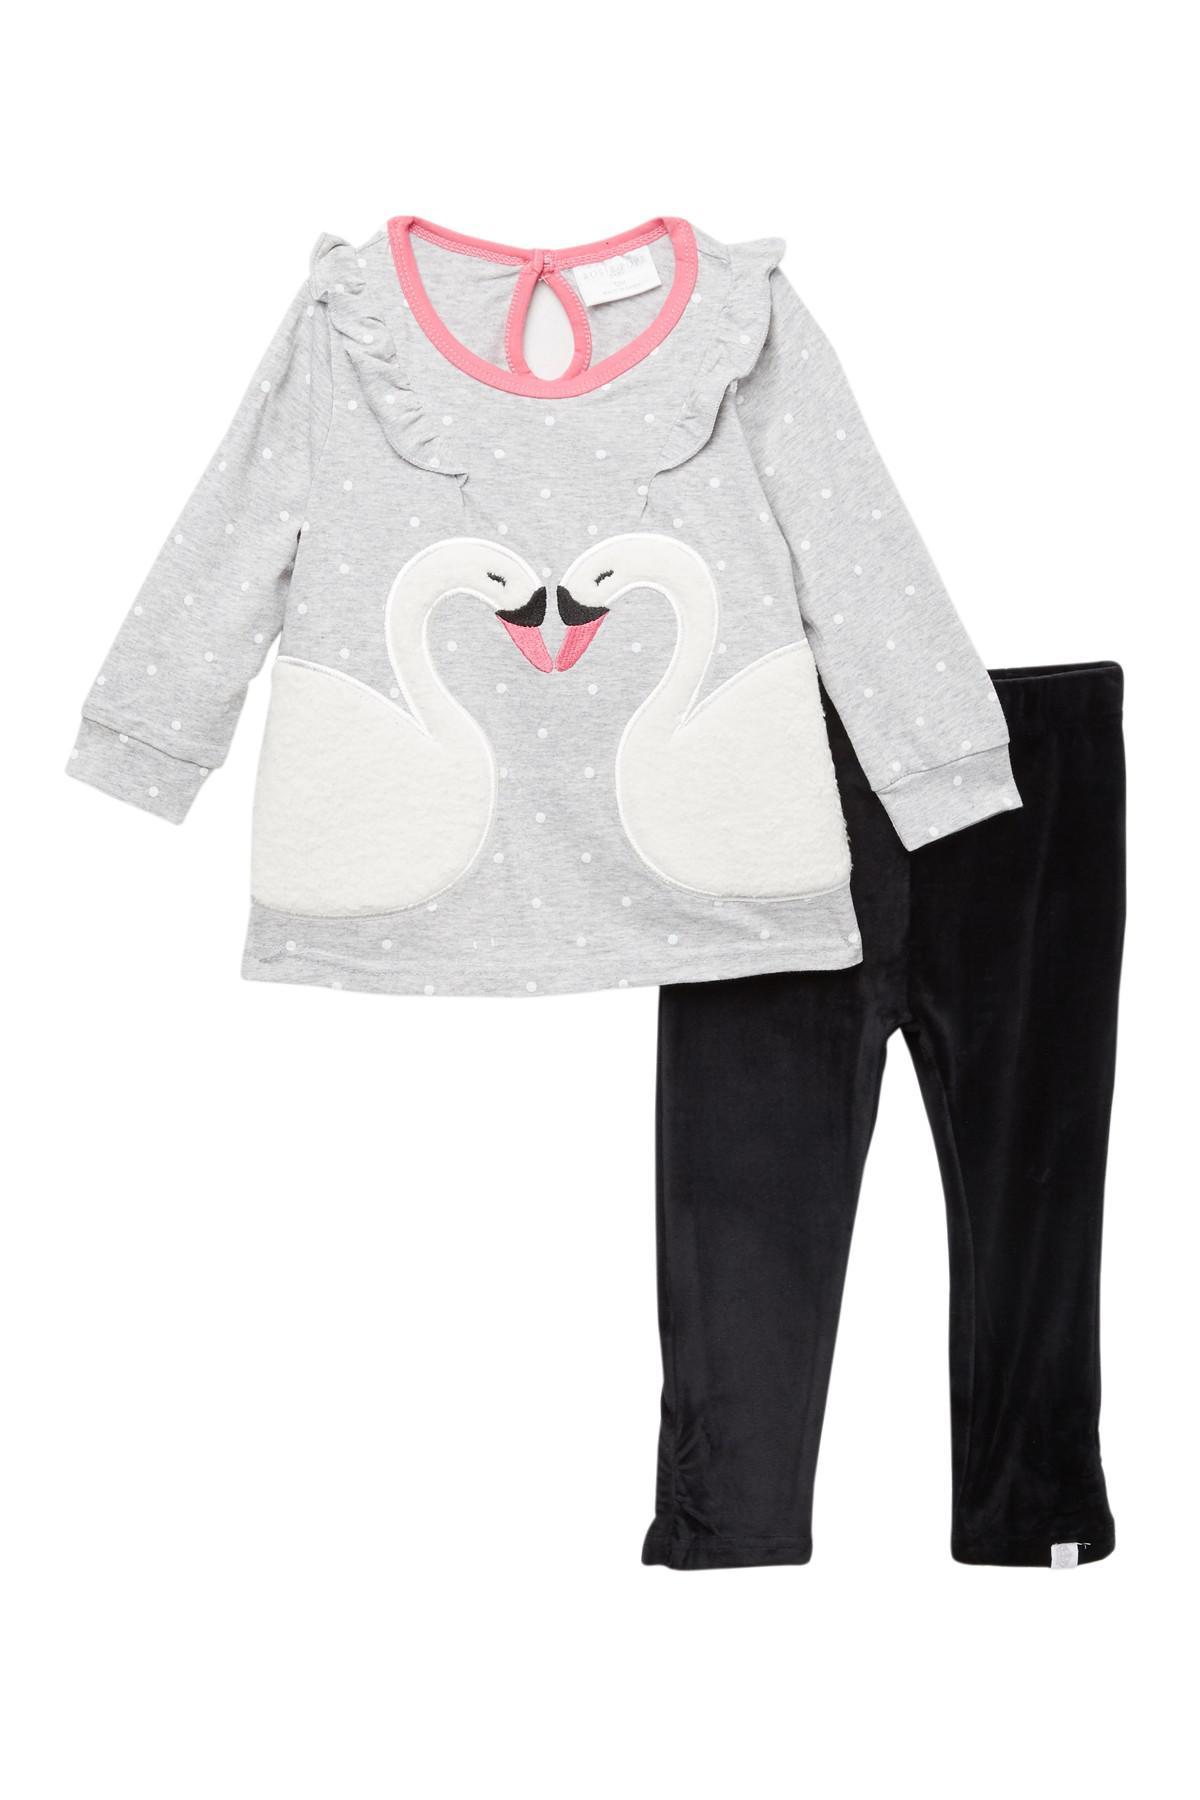 1adb66accba29 Rosie Pope Flutter Swan Tunic & Leggings Set (baby) in Gray - Lyst